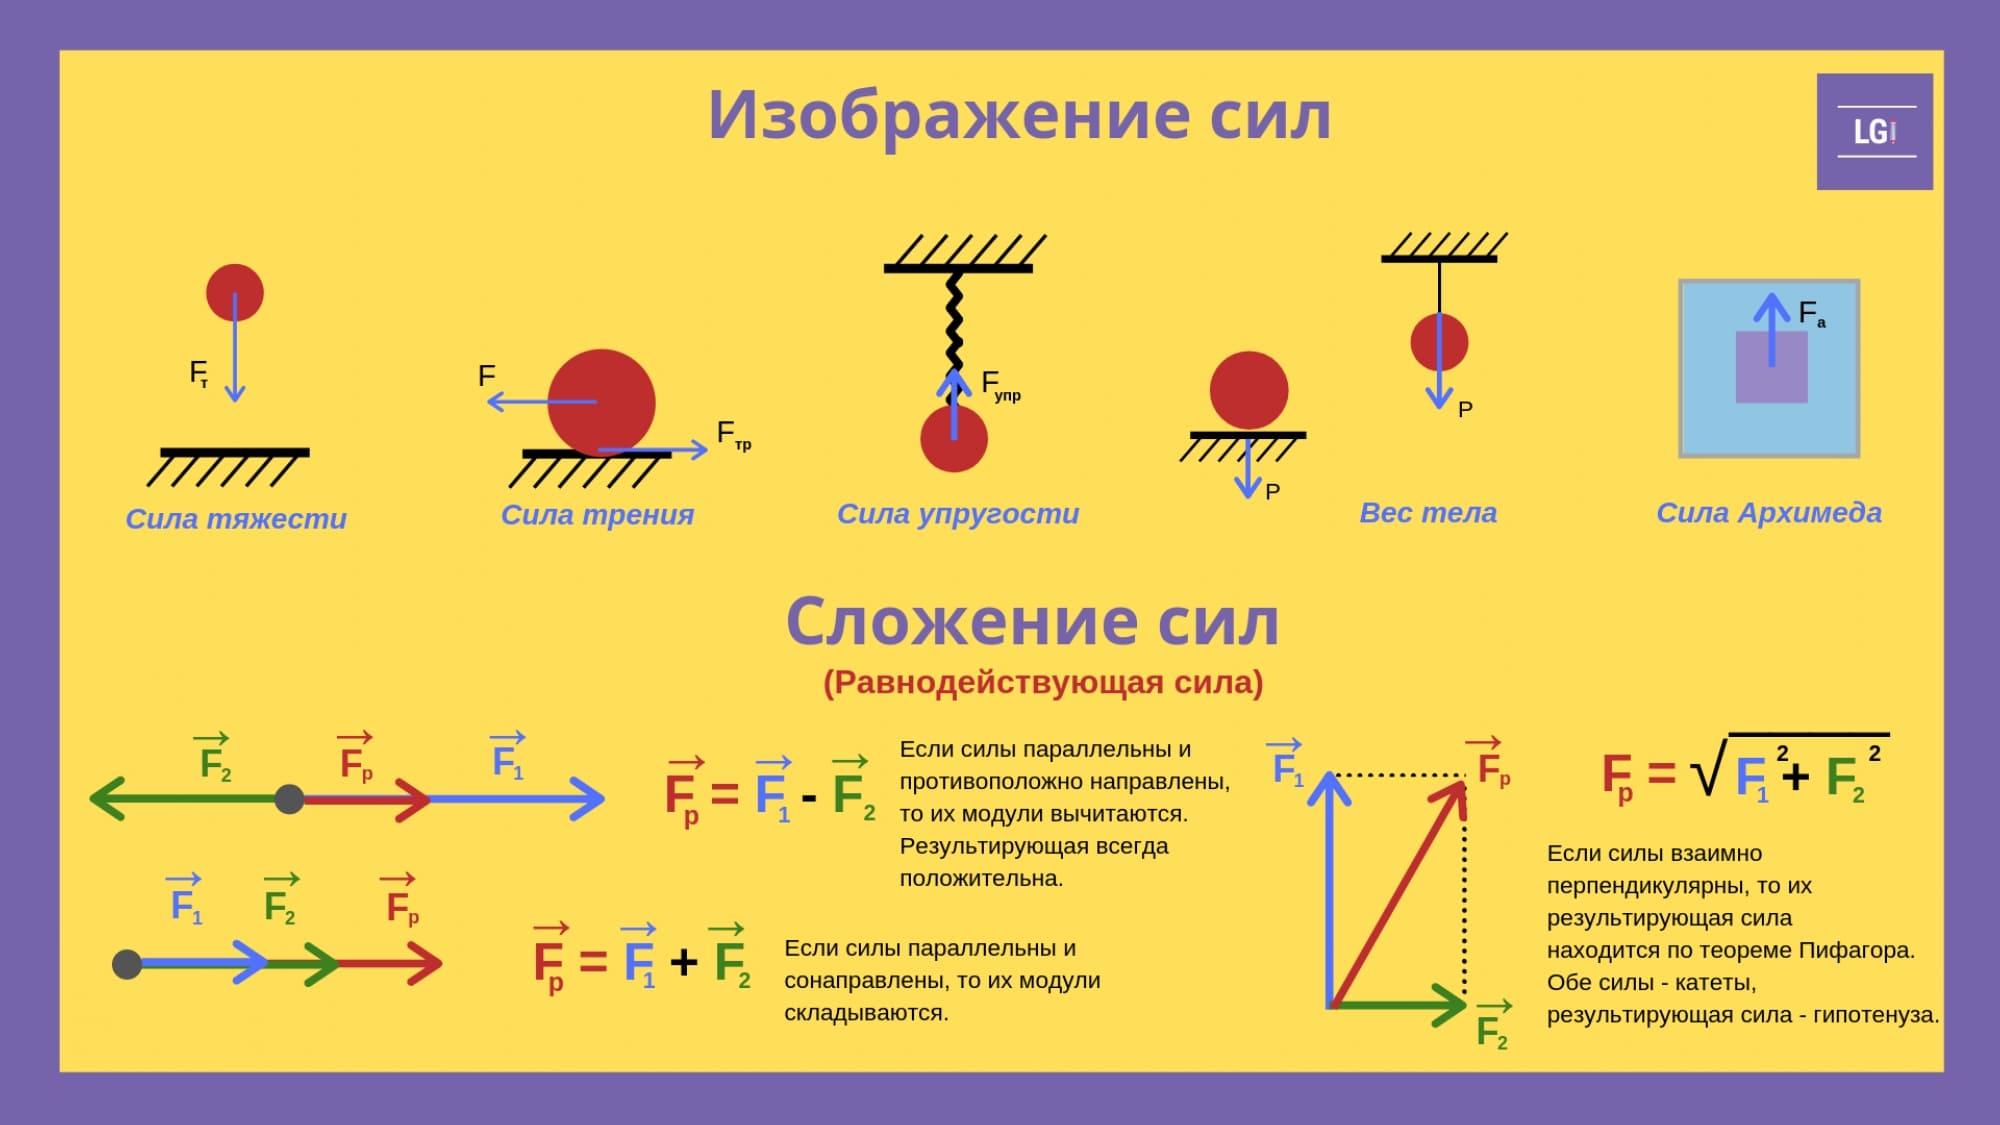 Готовимся к ВПР. Силы в природе. 7 класс. Физика. страница 4. Изображение сил. Сложение сил